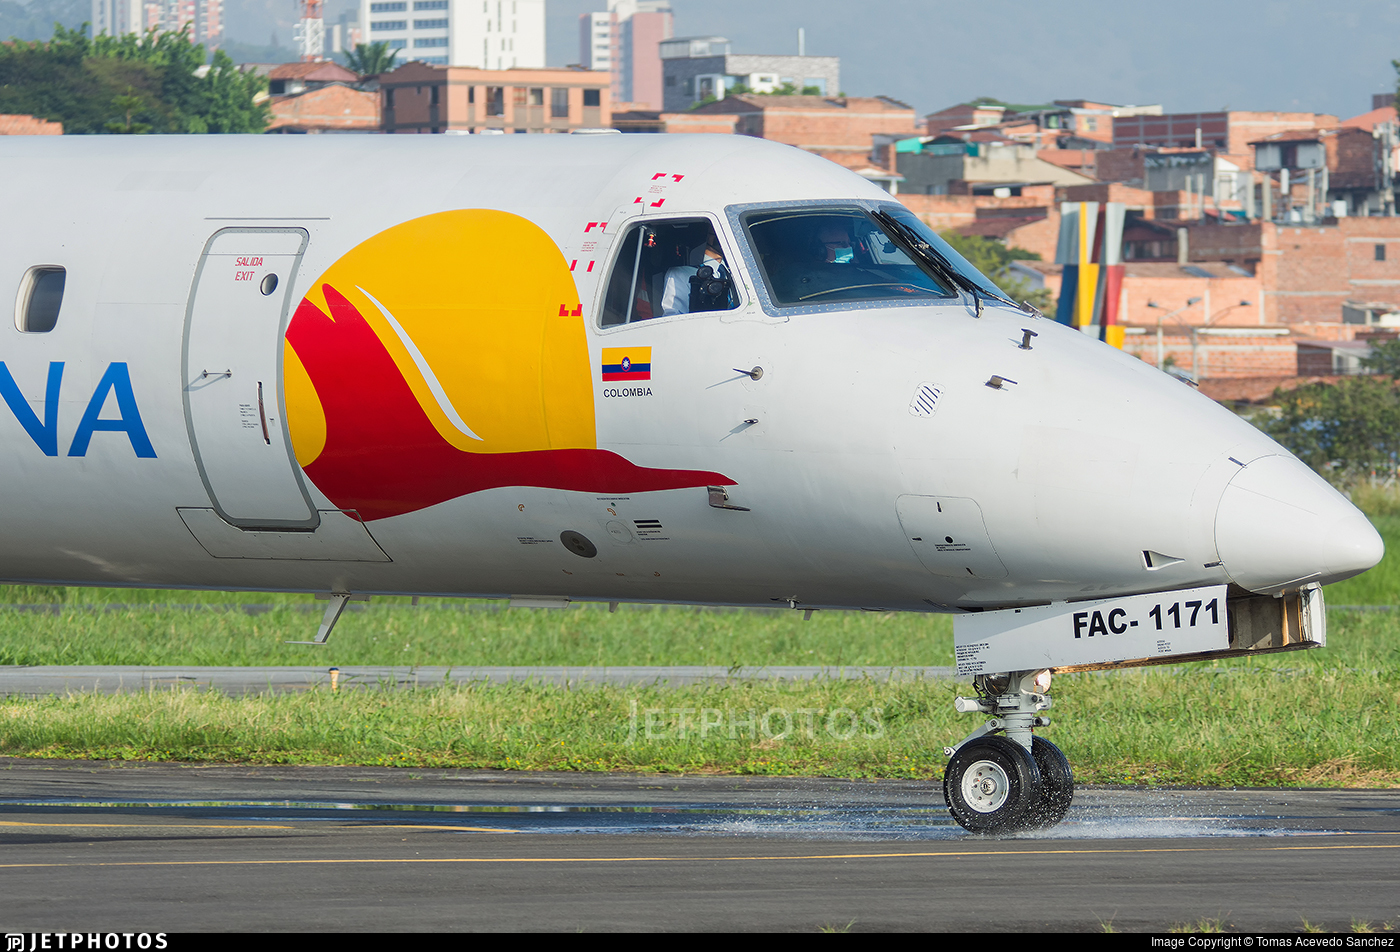 HK-4525 - Embraer ERJ-145LR - Satena